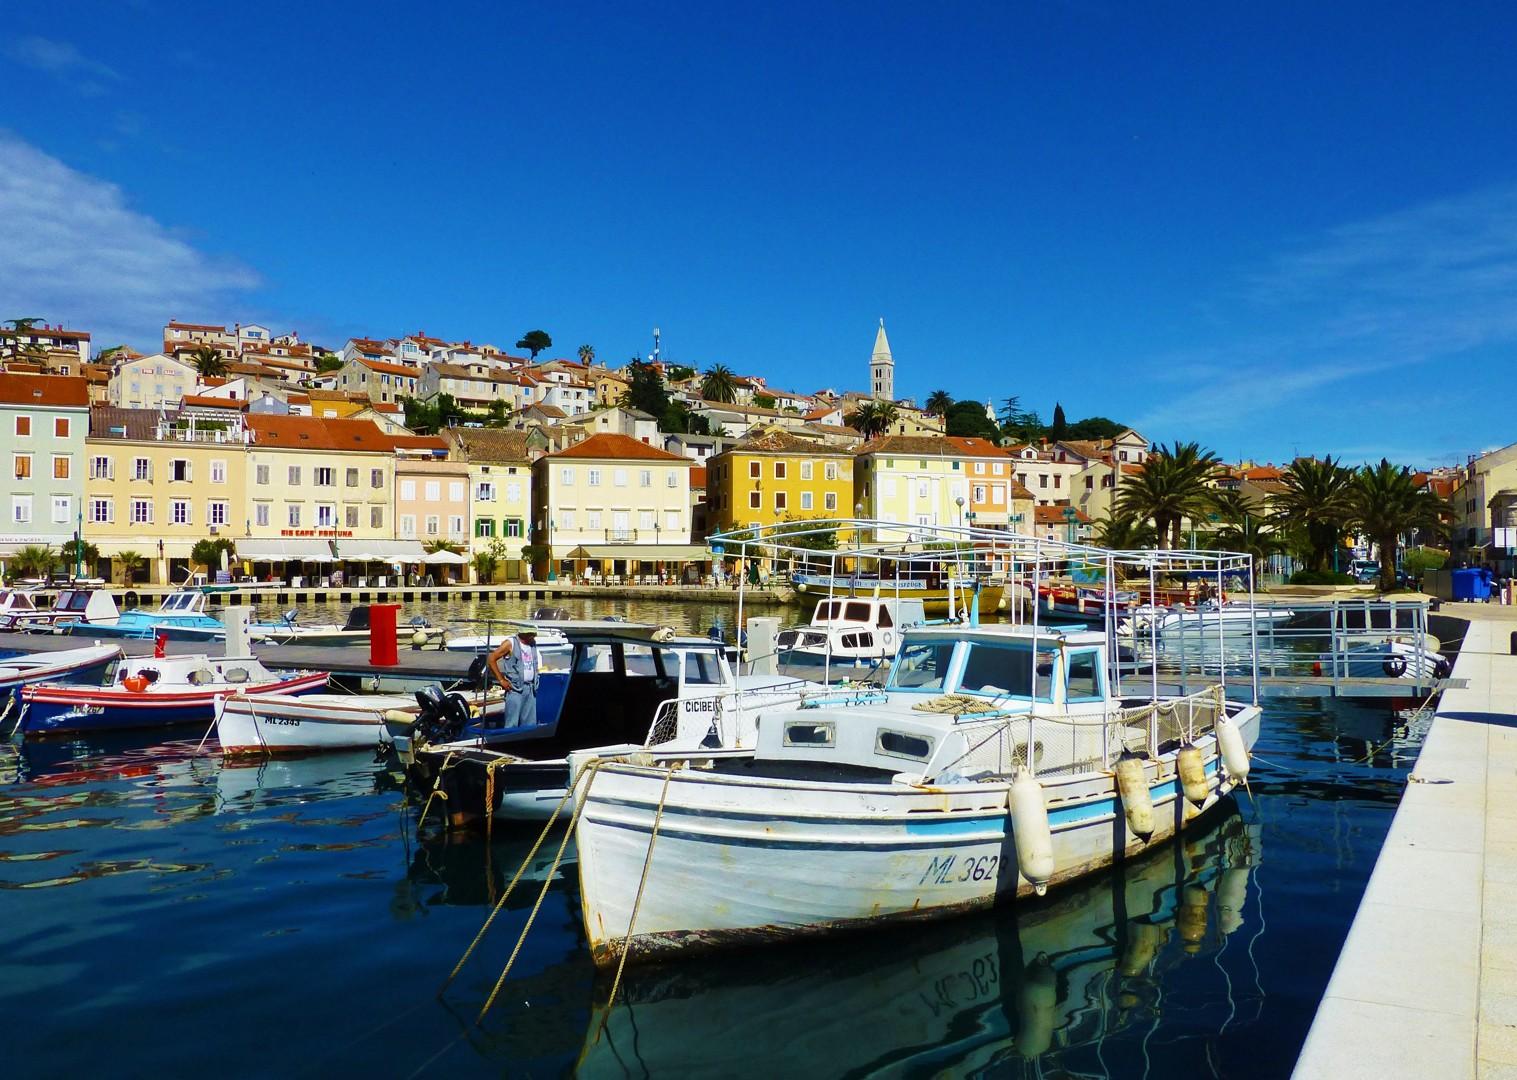 mali-losinj-cycling-leisure-boat-comfort-holiday-croatia.jpg - Croatia - Kvarner Bay - Bike and Boat Holiday - Leisure Cycling